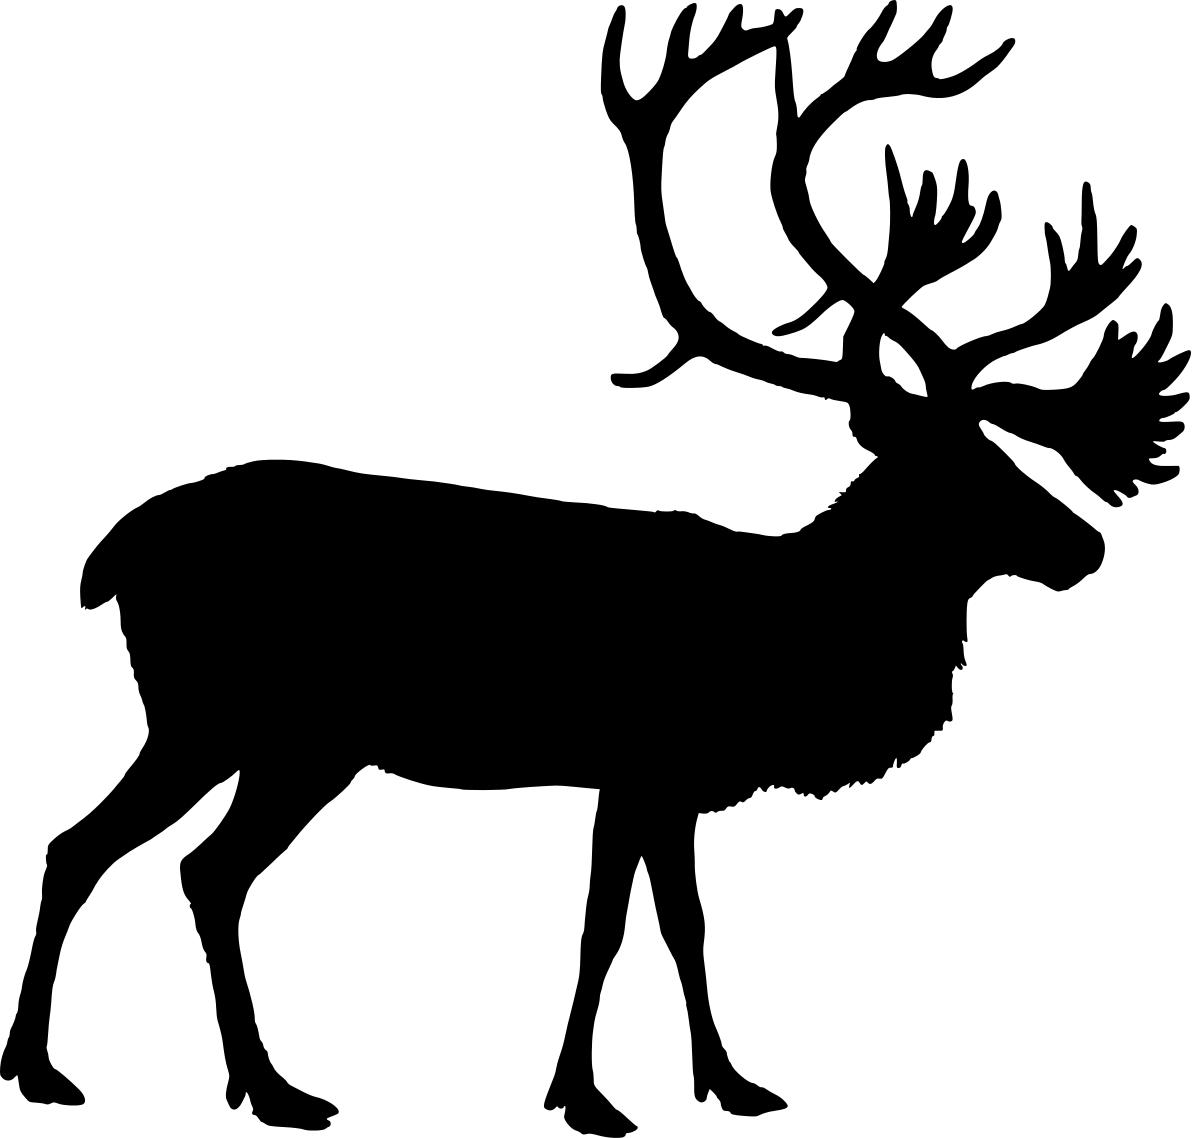 1192x1138 Best Photos Of Reindeer Head Silhouette